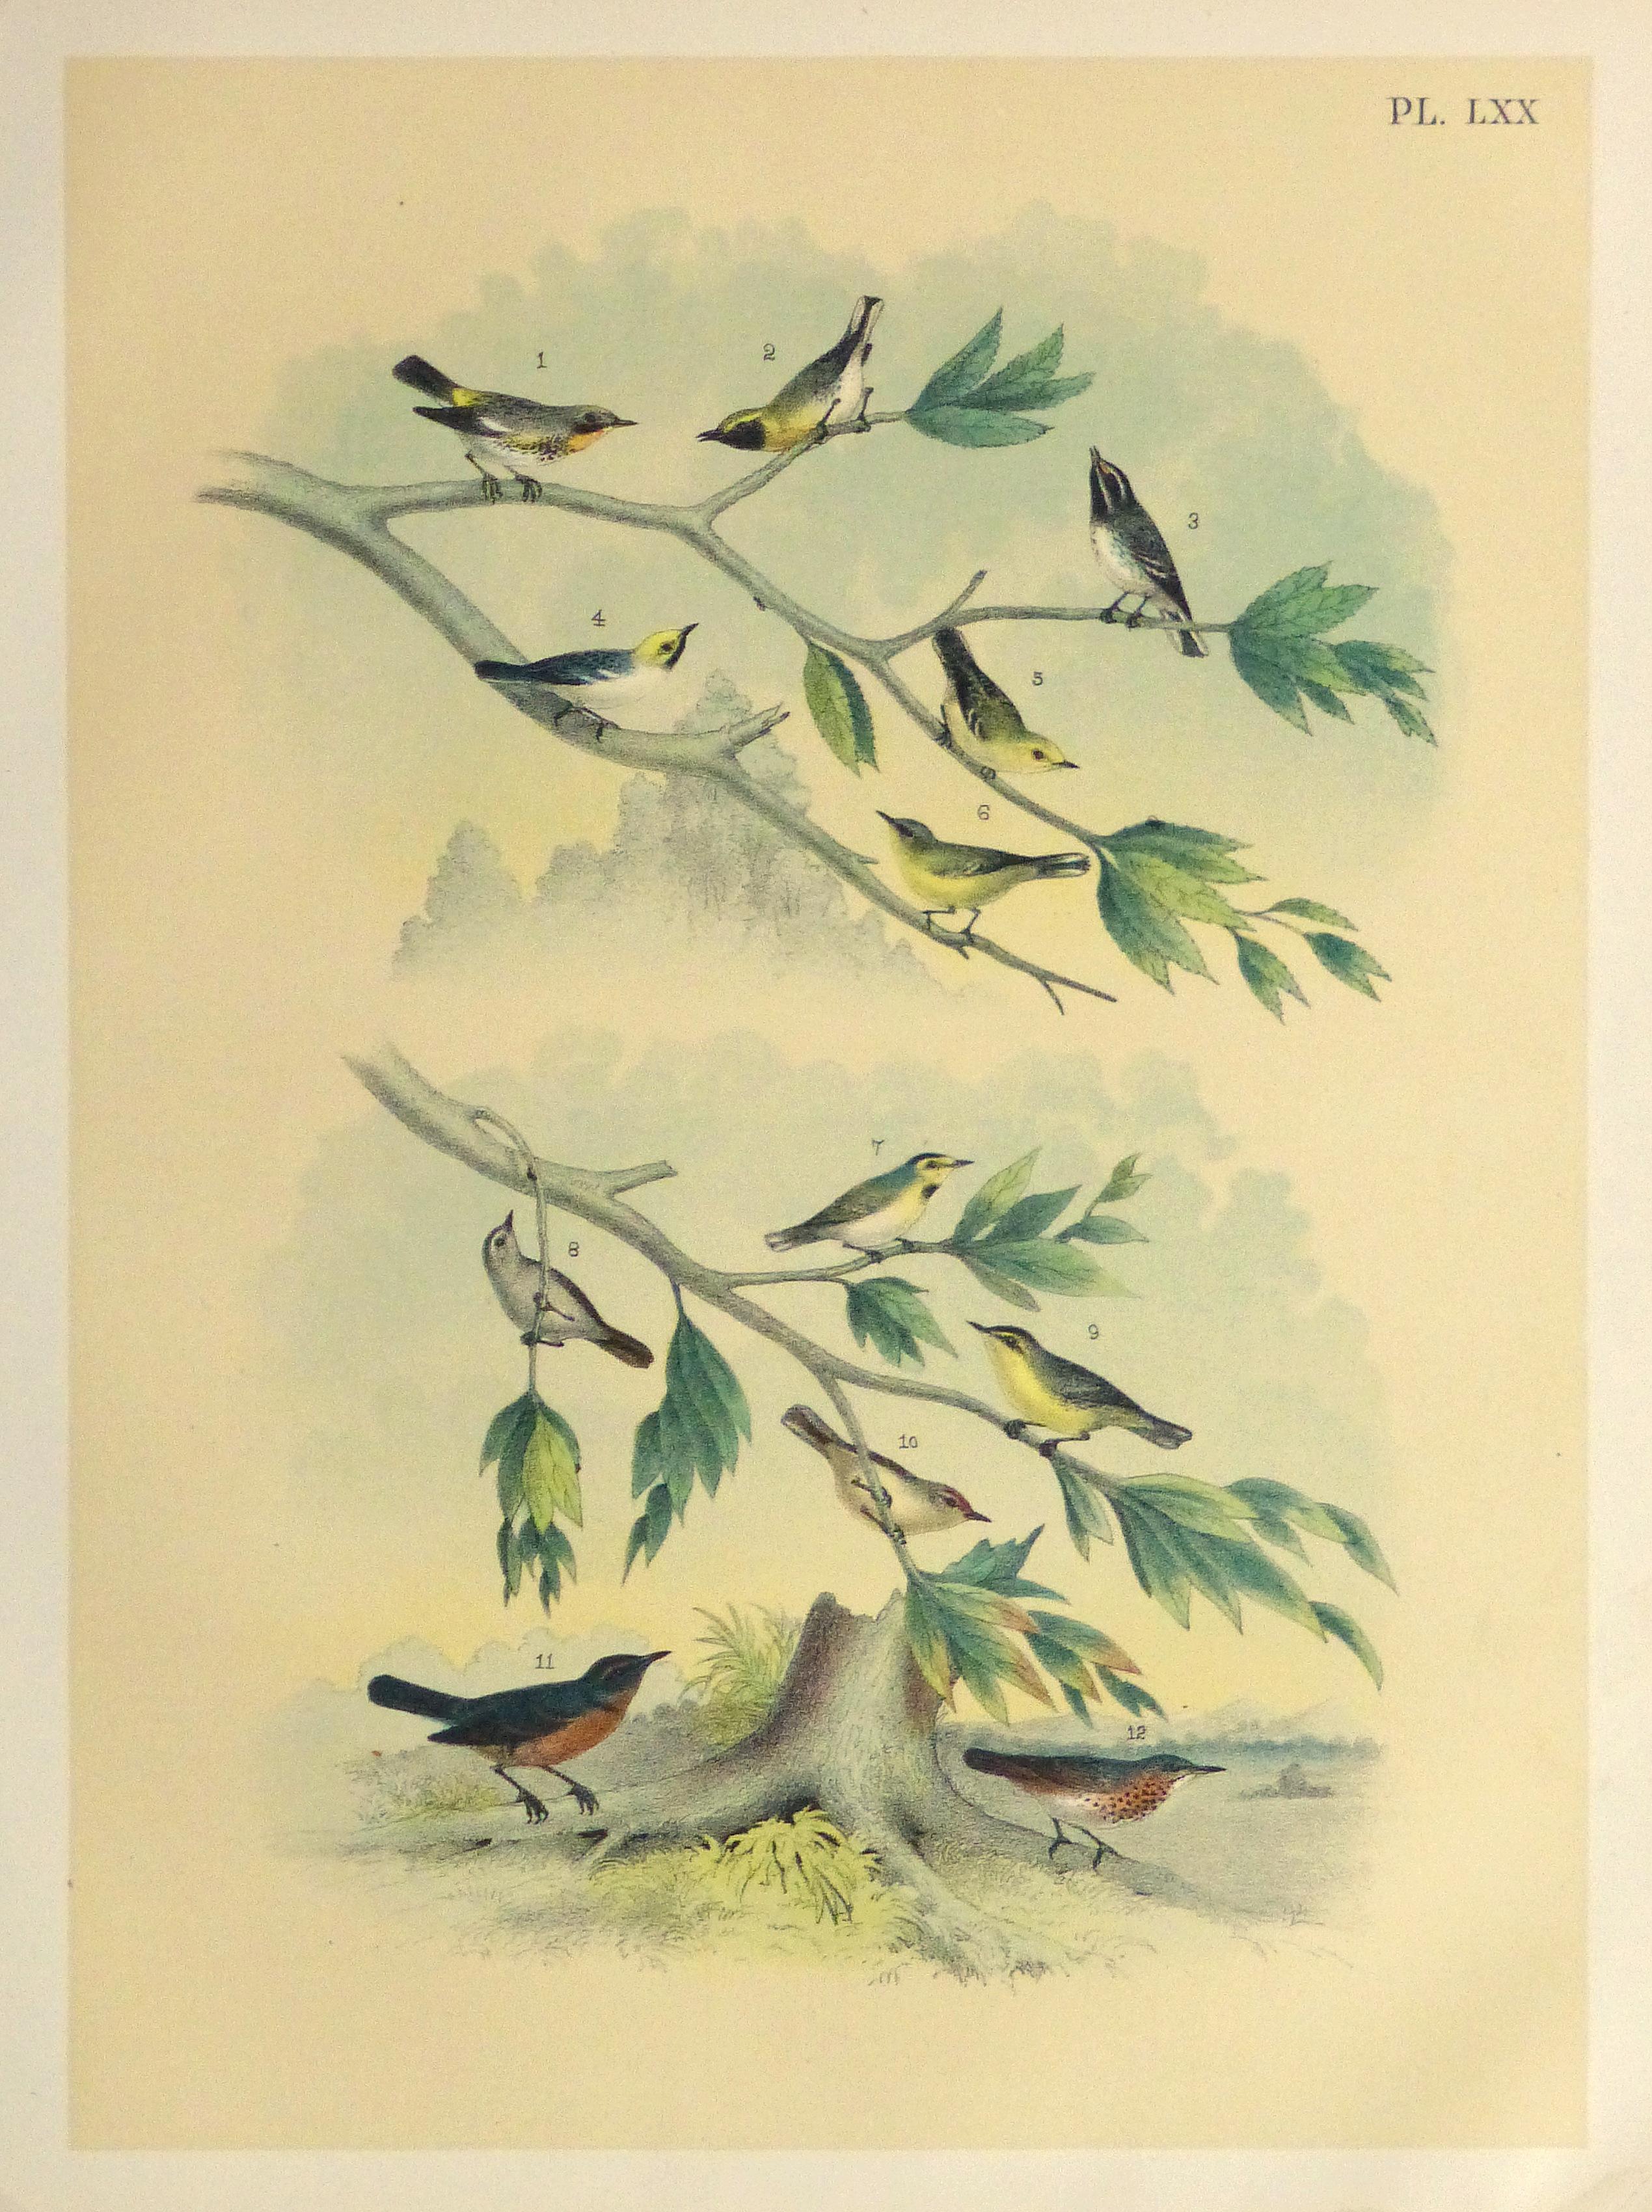 Lithograph- North American Songbirds, 1881-main-10542M